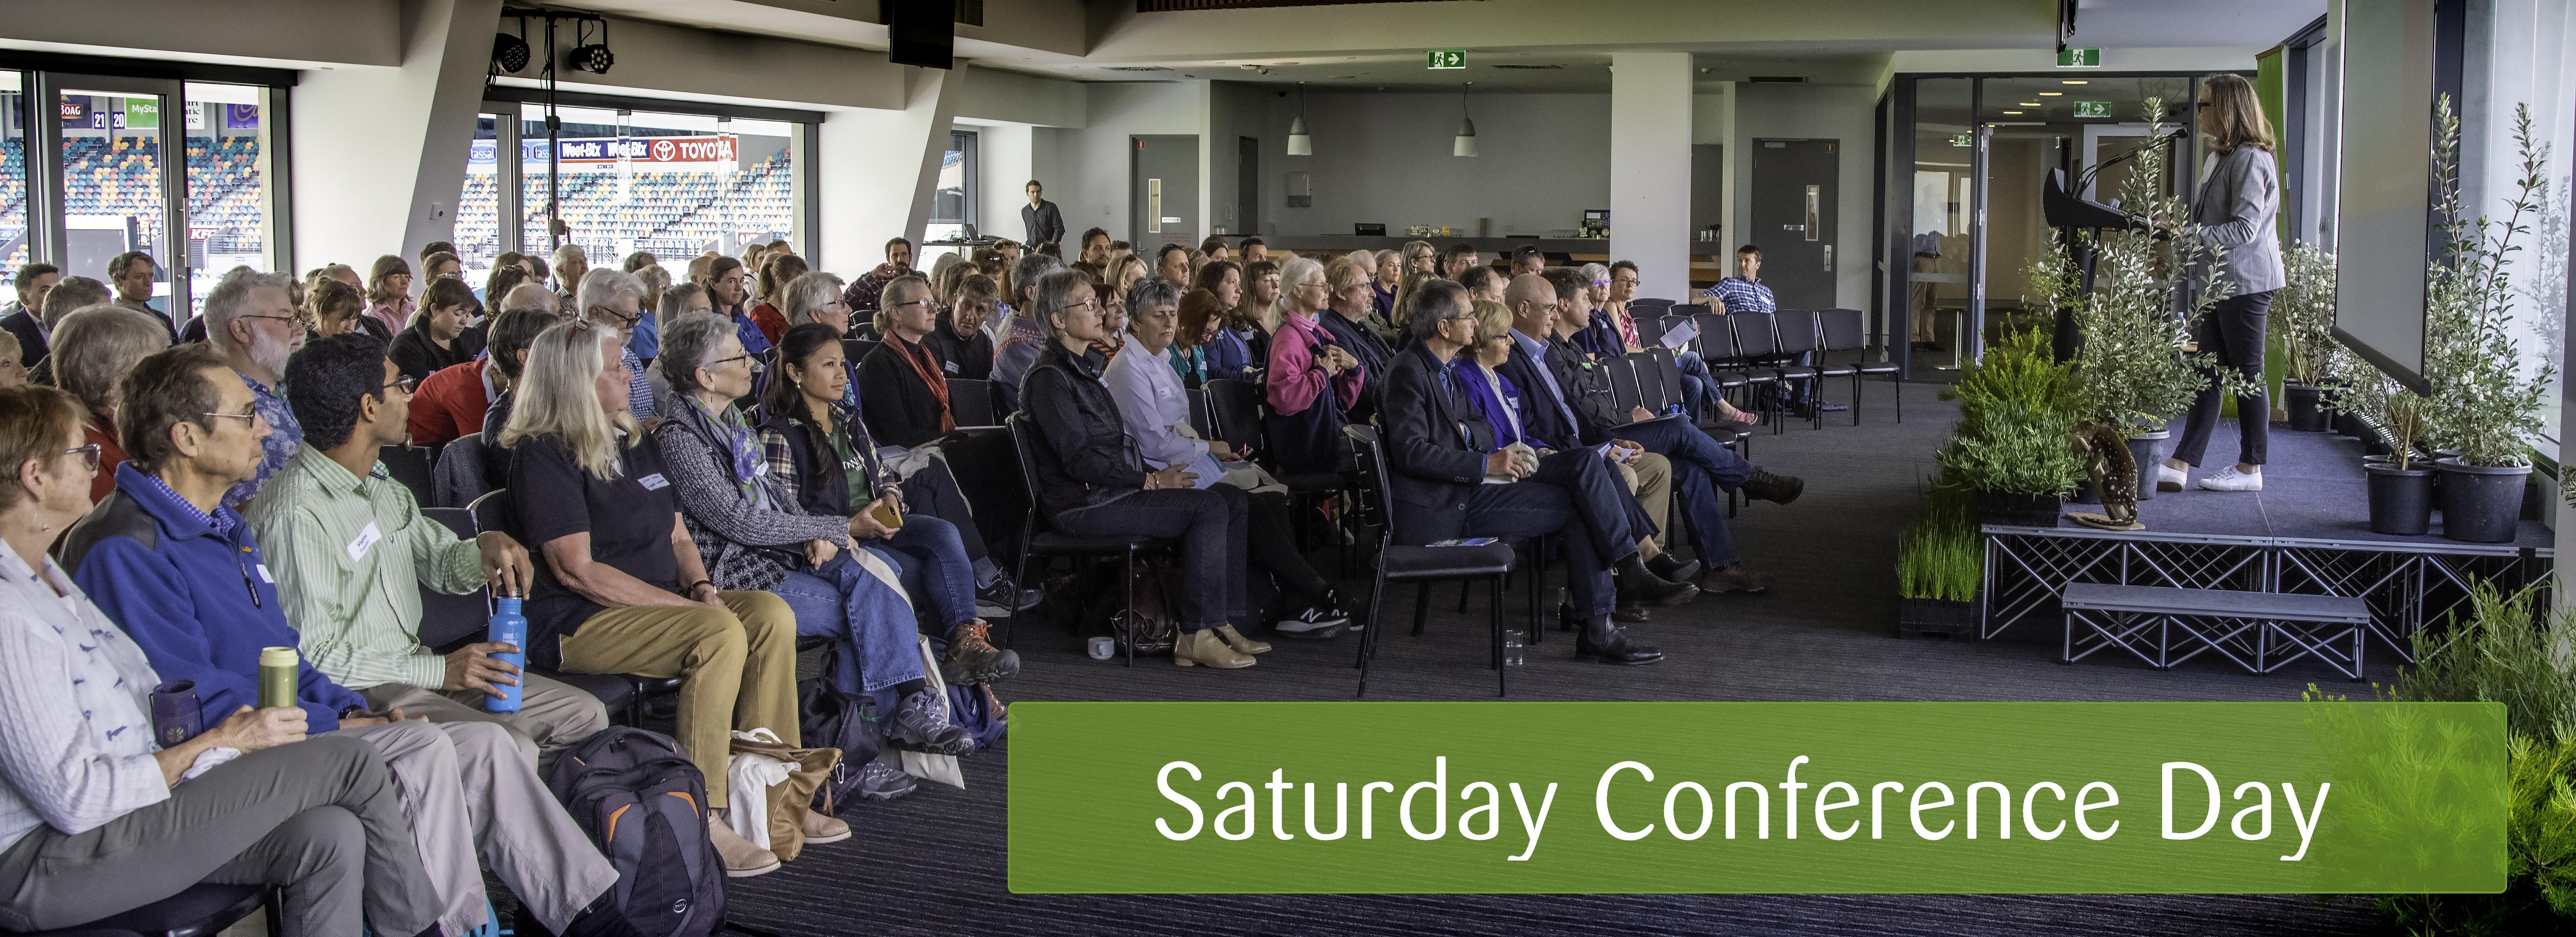 20191026_conf19_ConferenceDay__Phil_Milner_(13).jpg